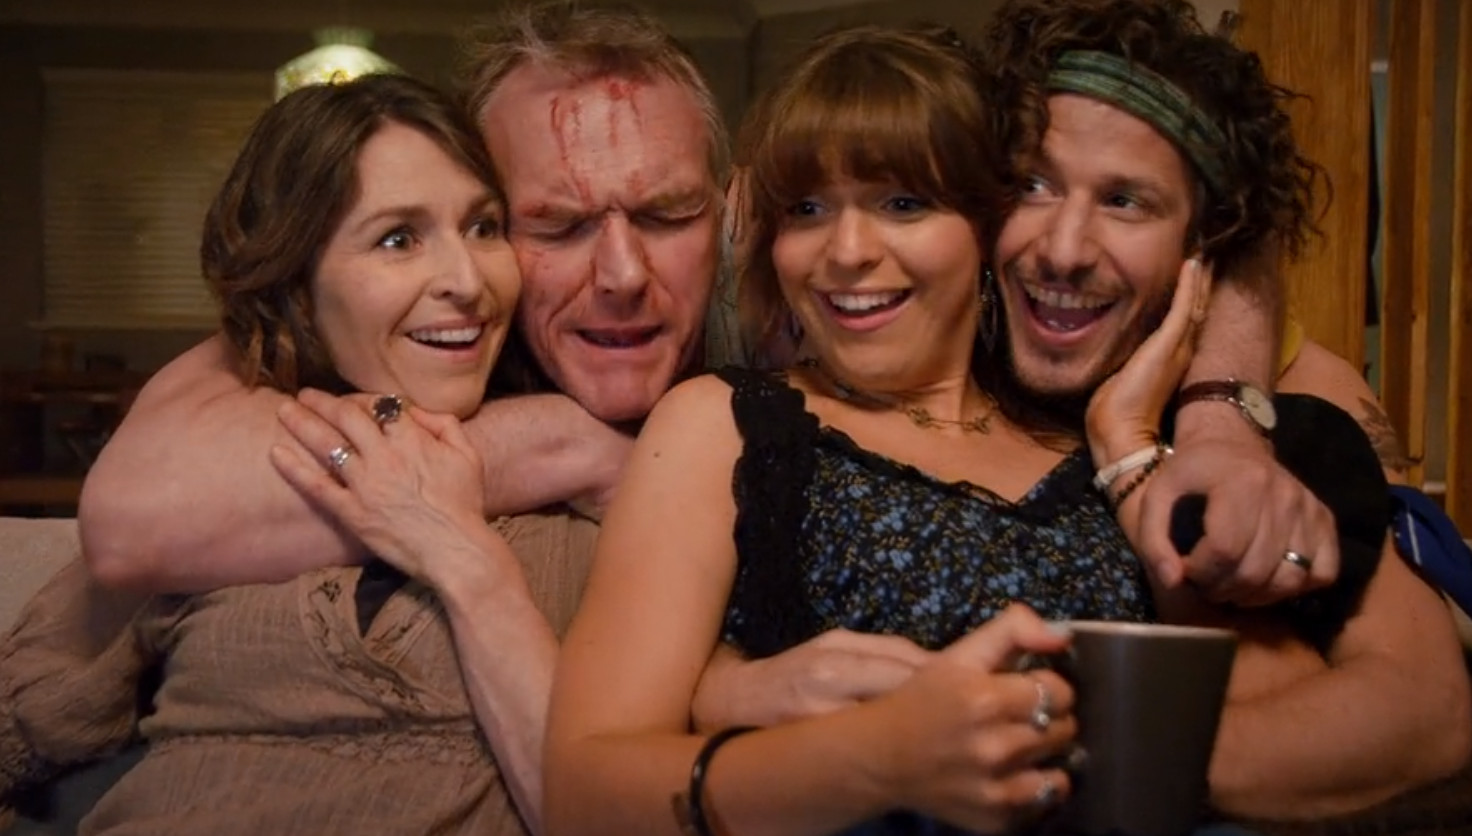 cuckoo series 1 episode 3 cast